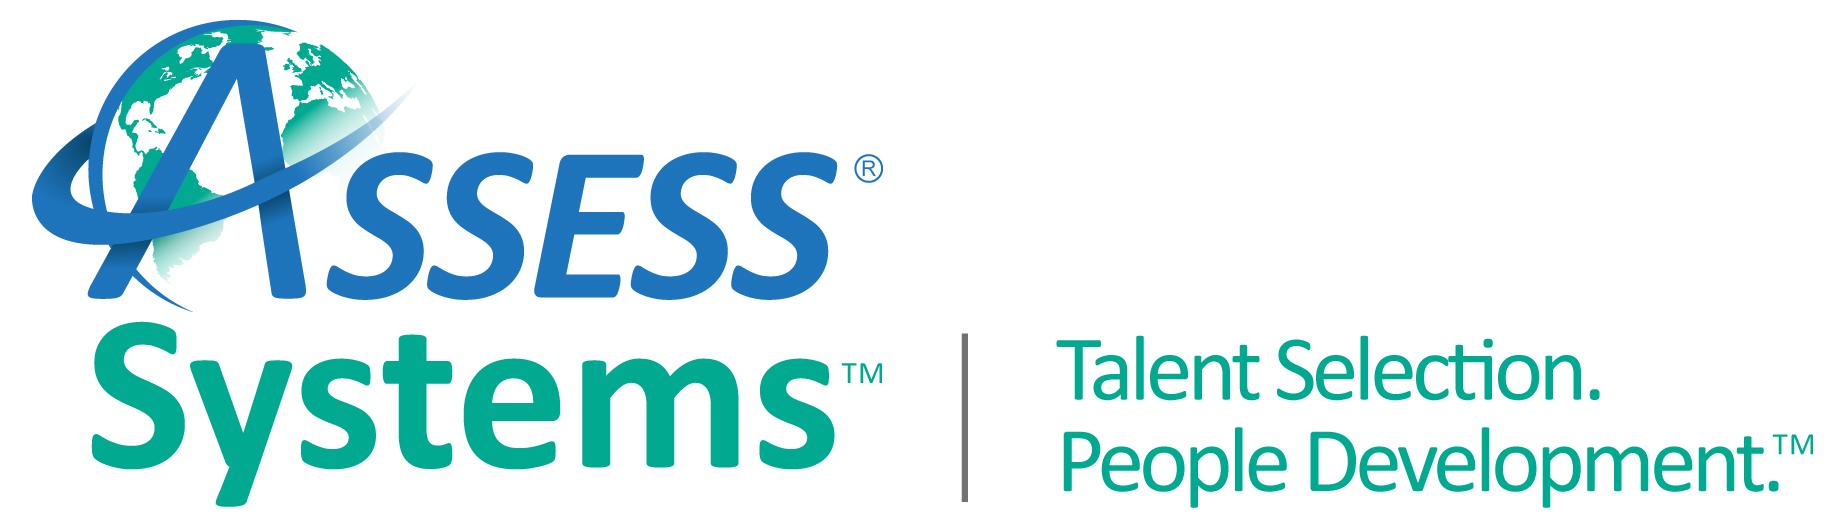 assess systems logo